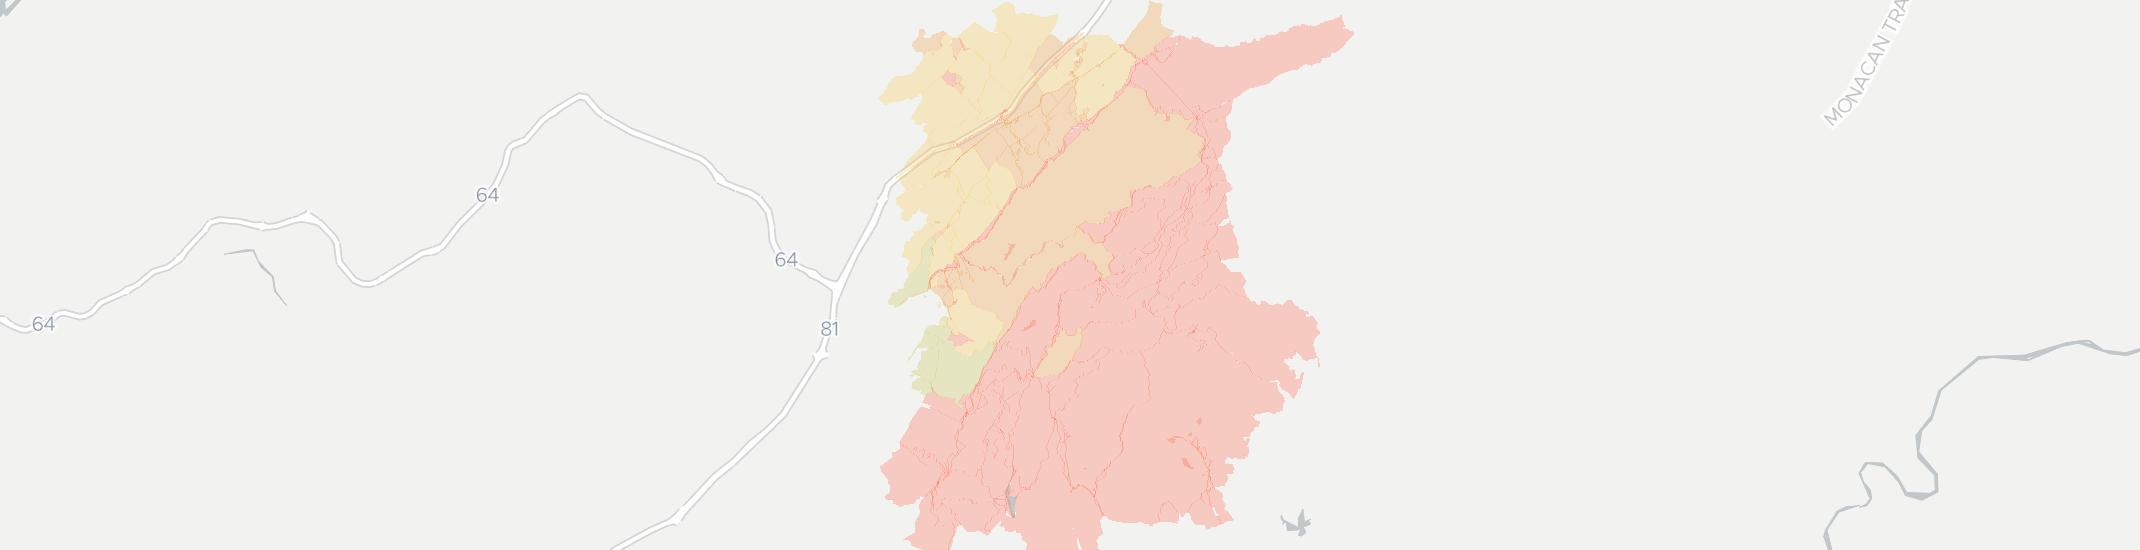 Vesuvius Internet Competition Map. Click for interactive map.